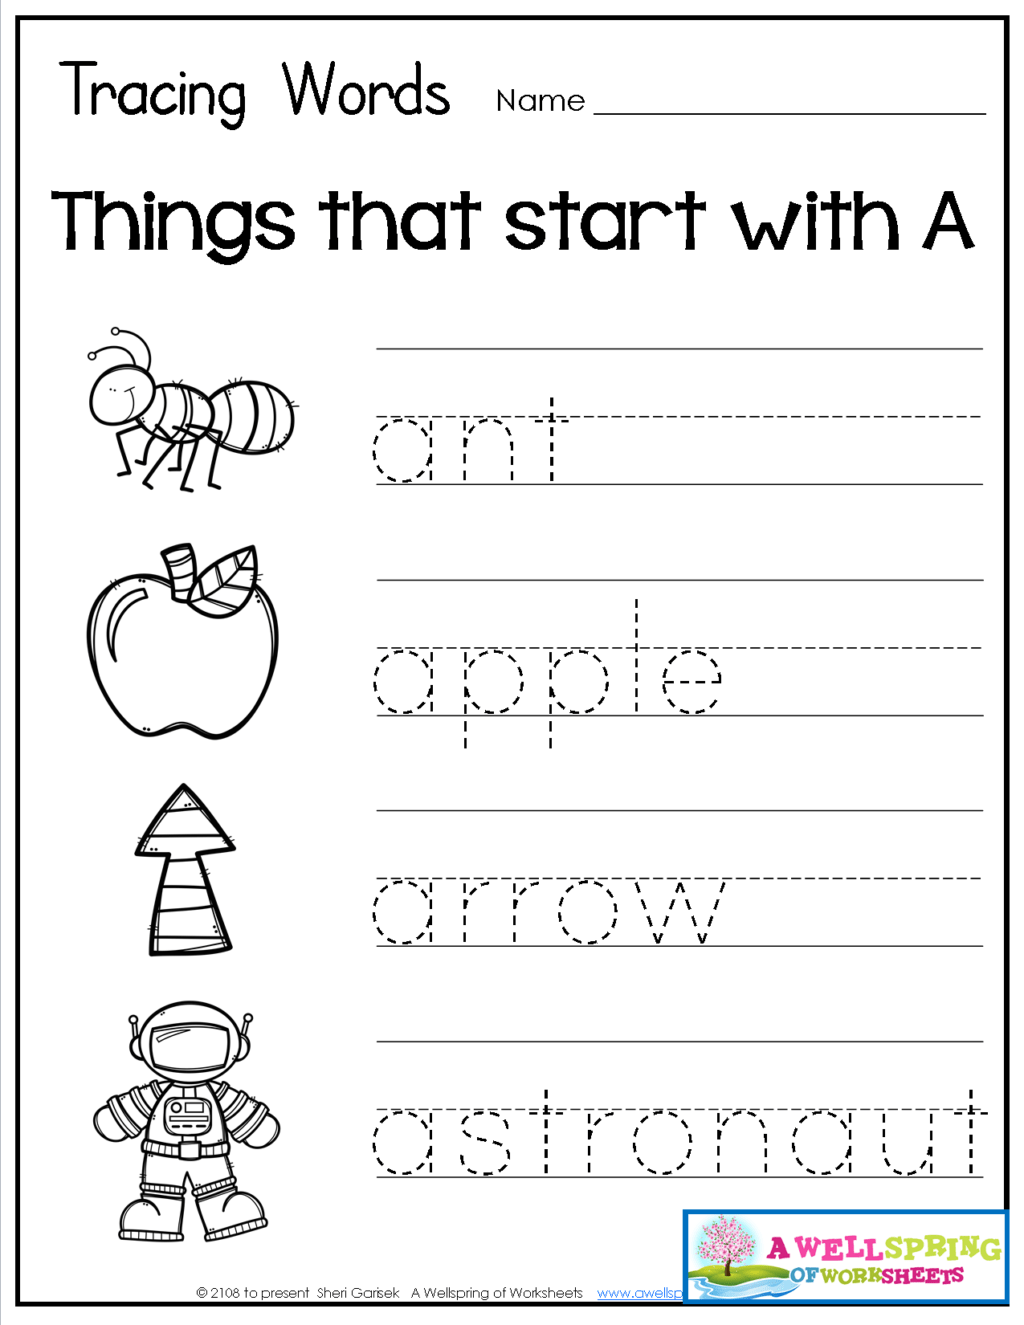 Create Tracing Worksheets For Preschool